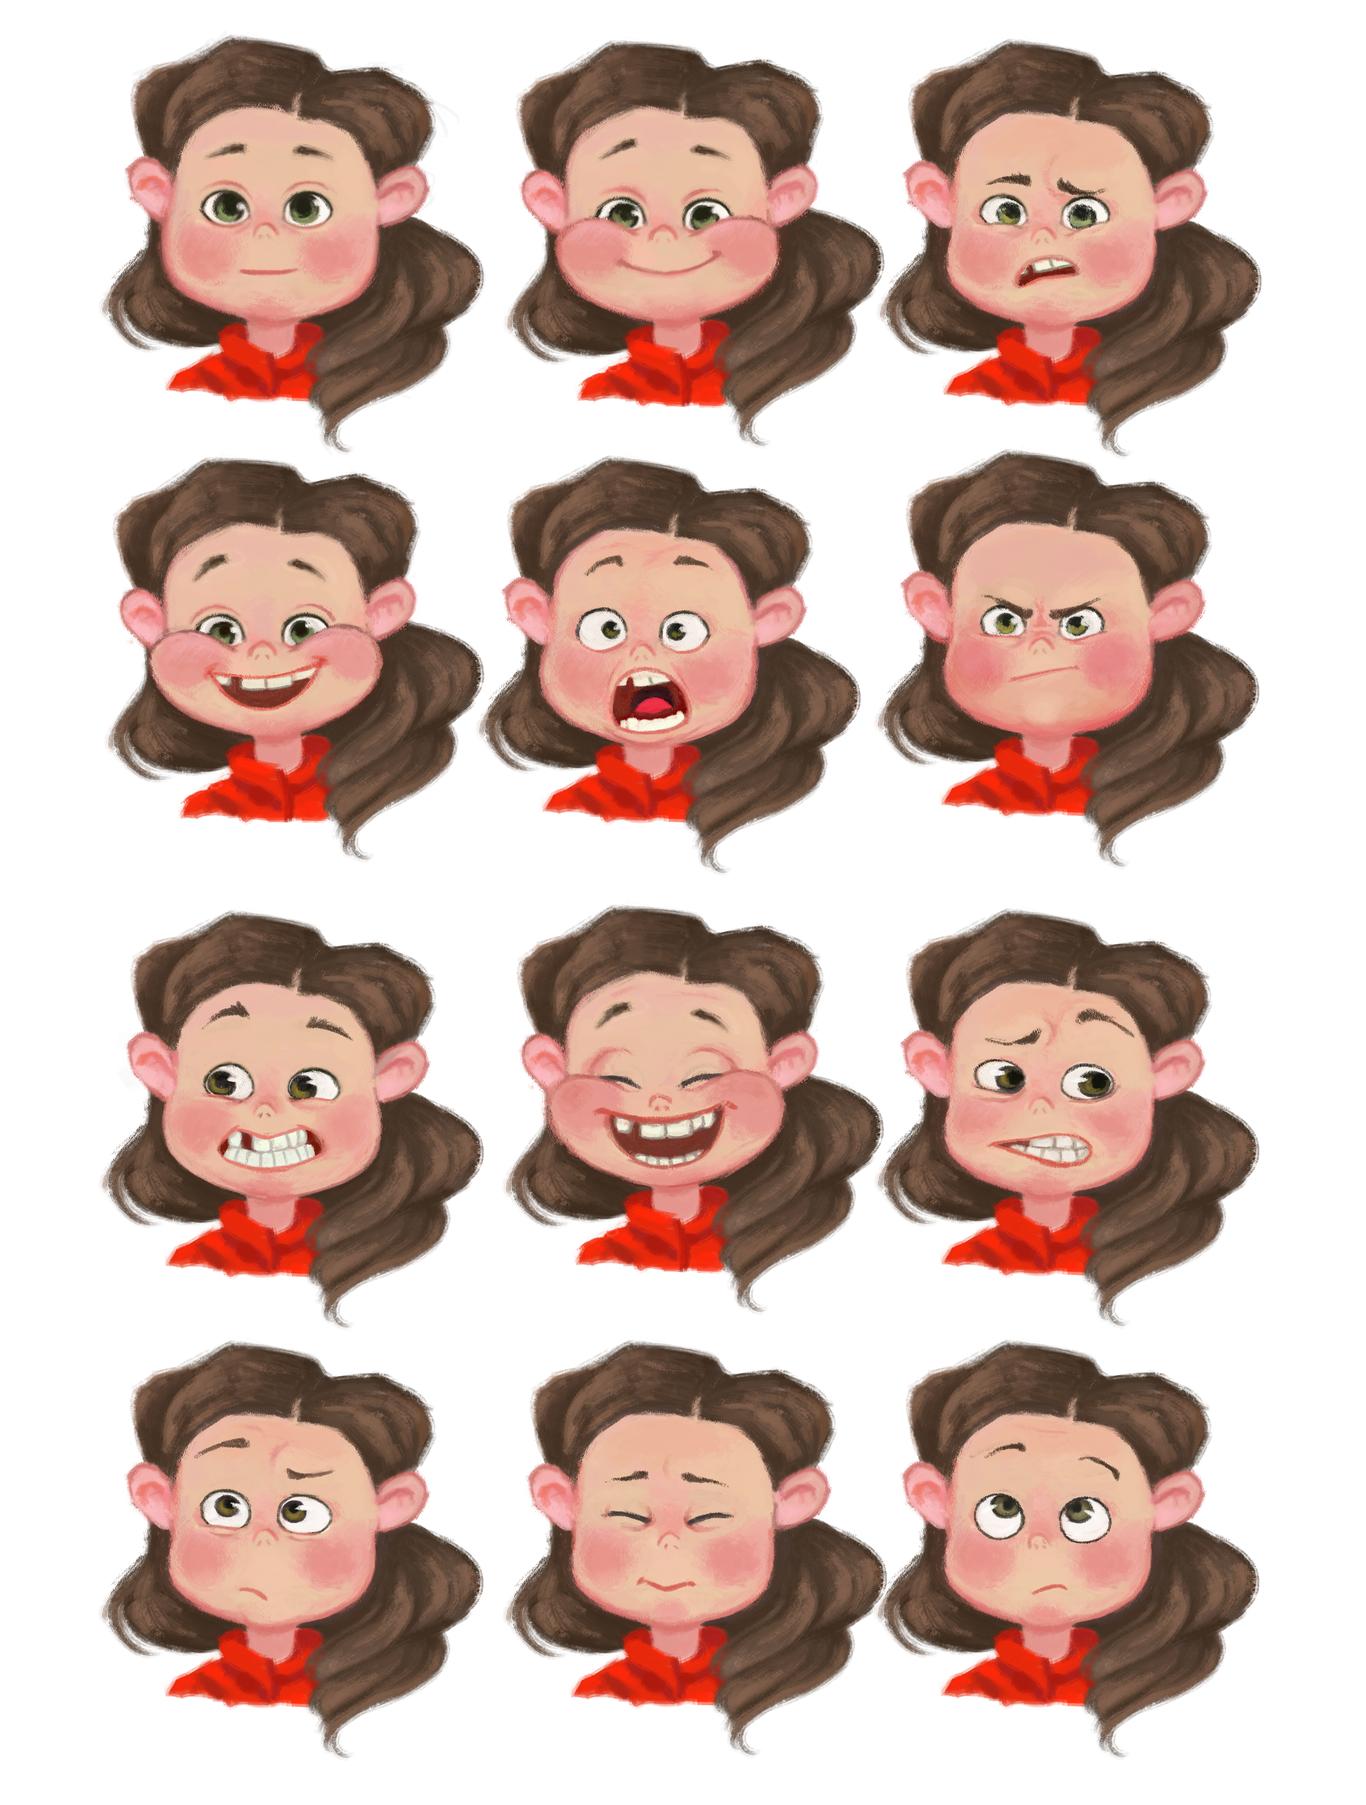 Anastasia gurova expressions 1 be19fa7c avwp